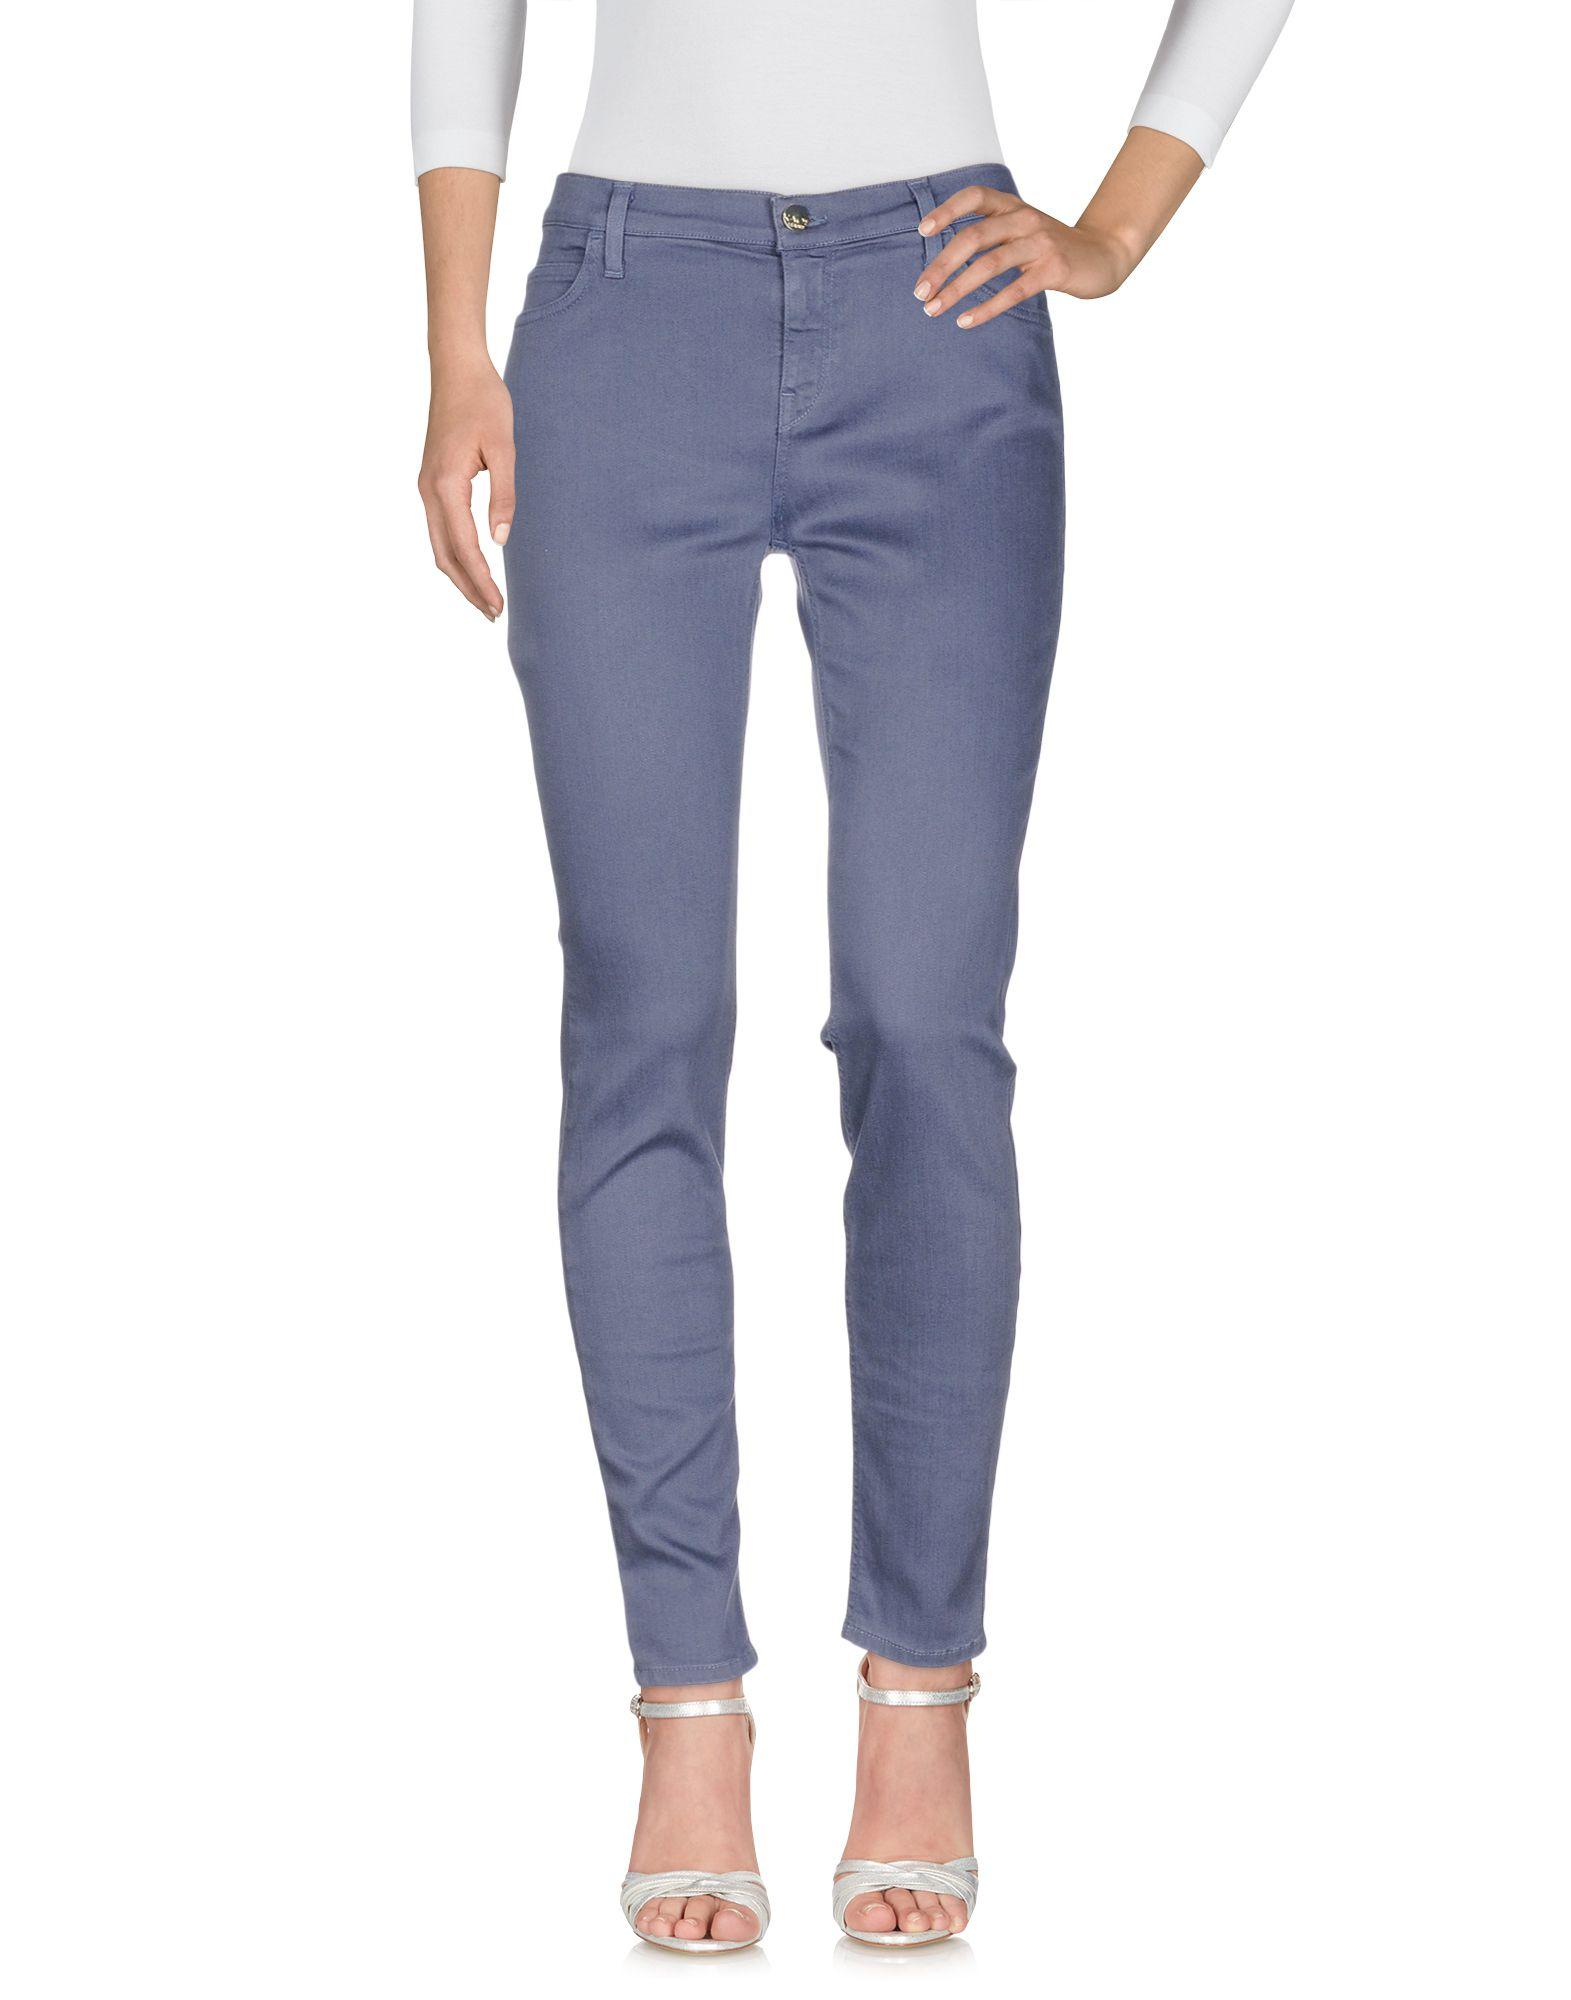 Pantaloni Jeans Kaos Jeans Donna - Acquista online su 147fQq